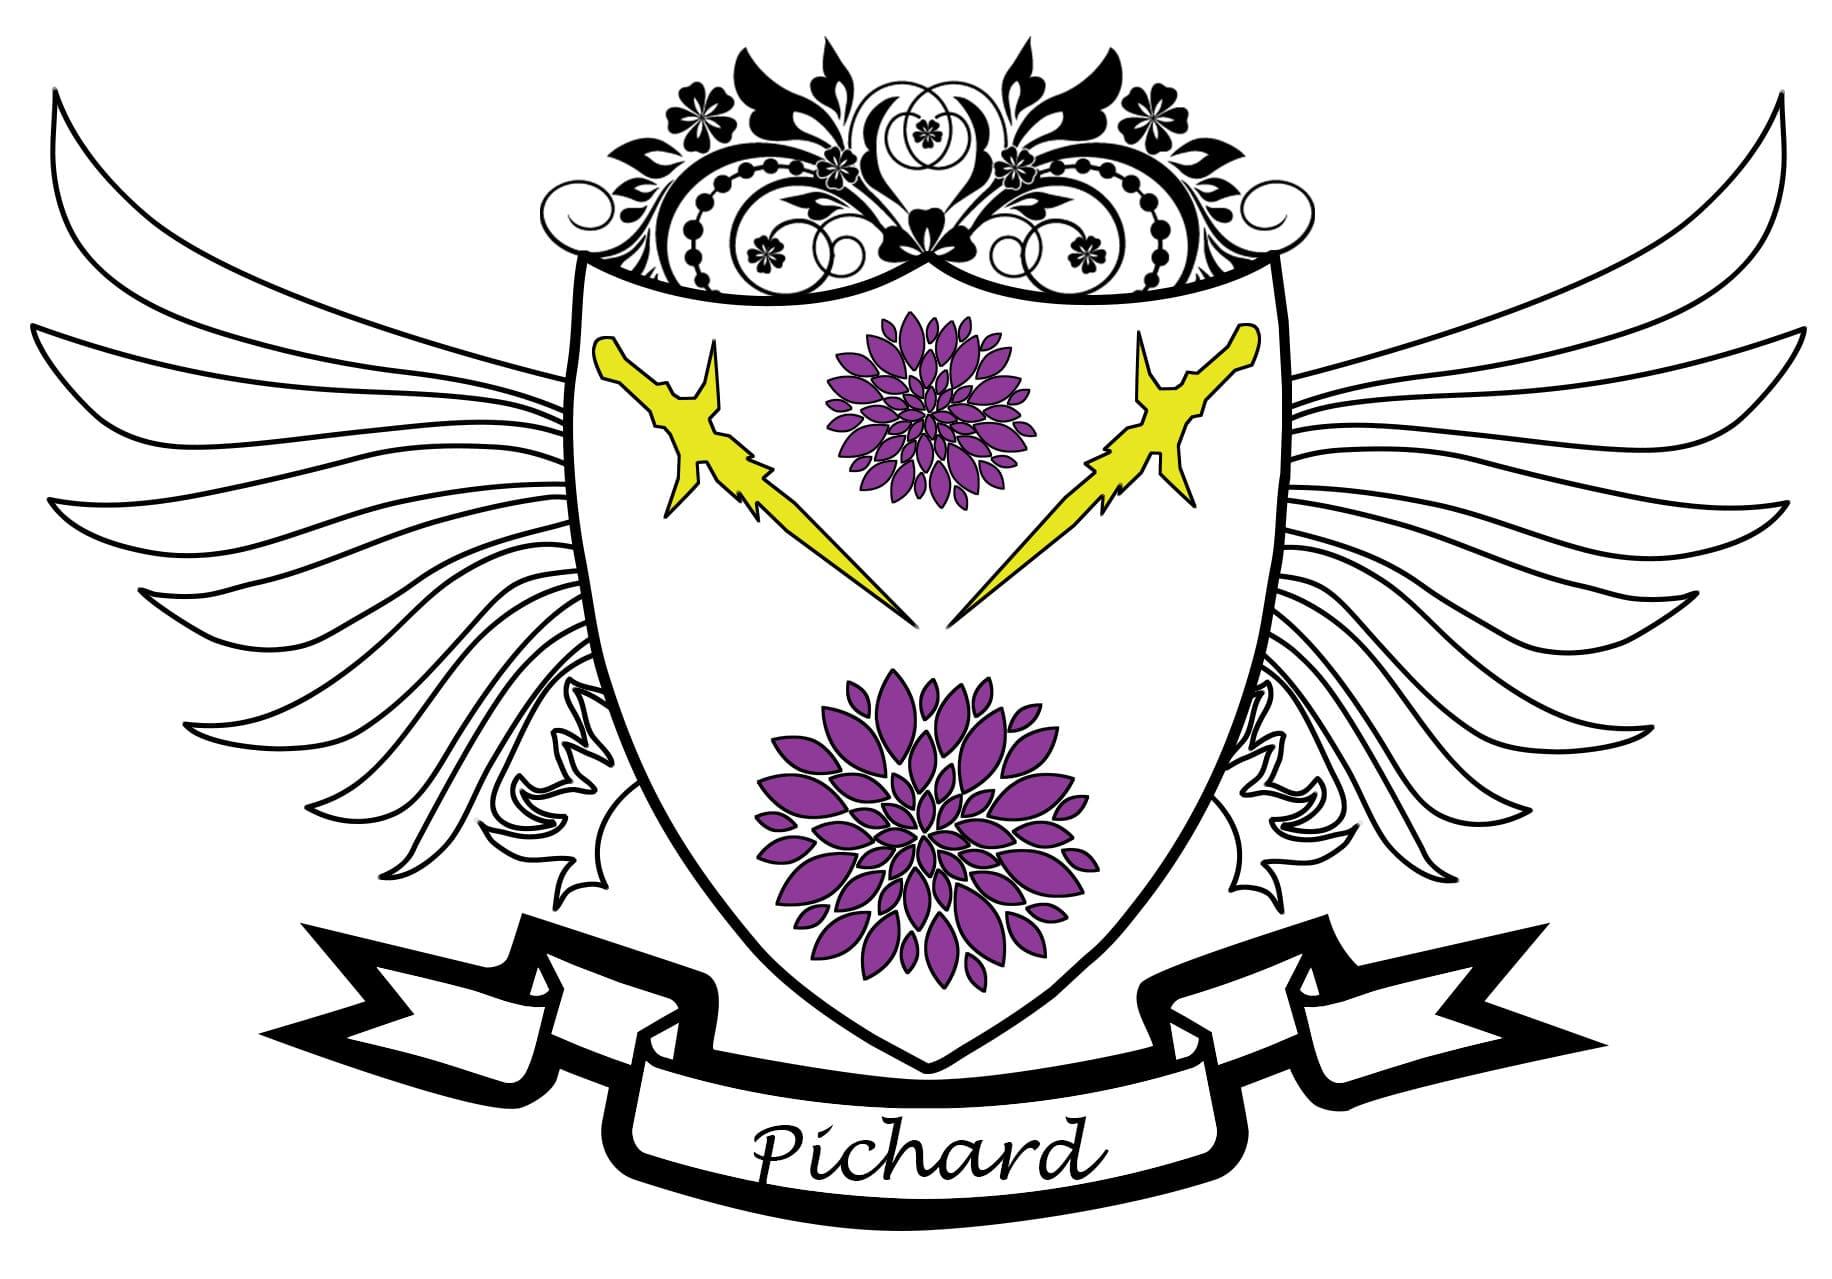 Pichard.jpg